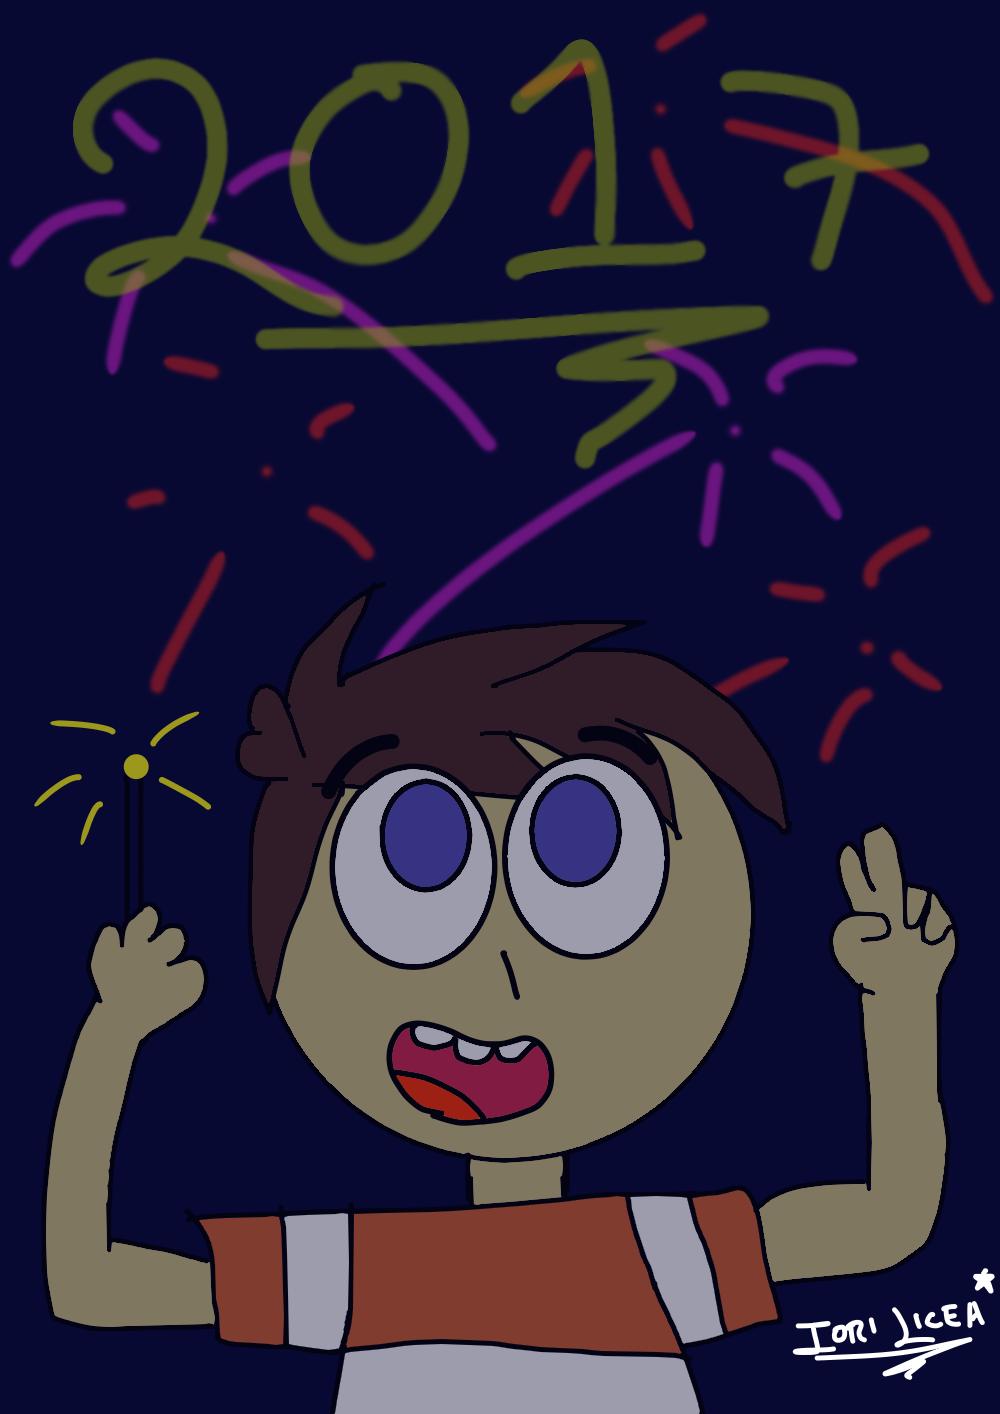 Happy New Year - December 2016